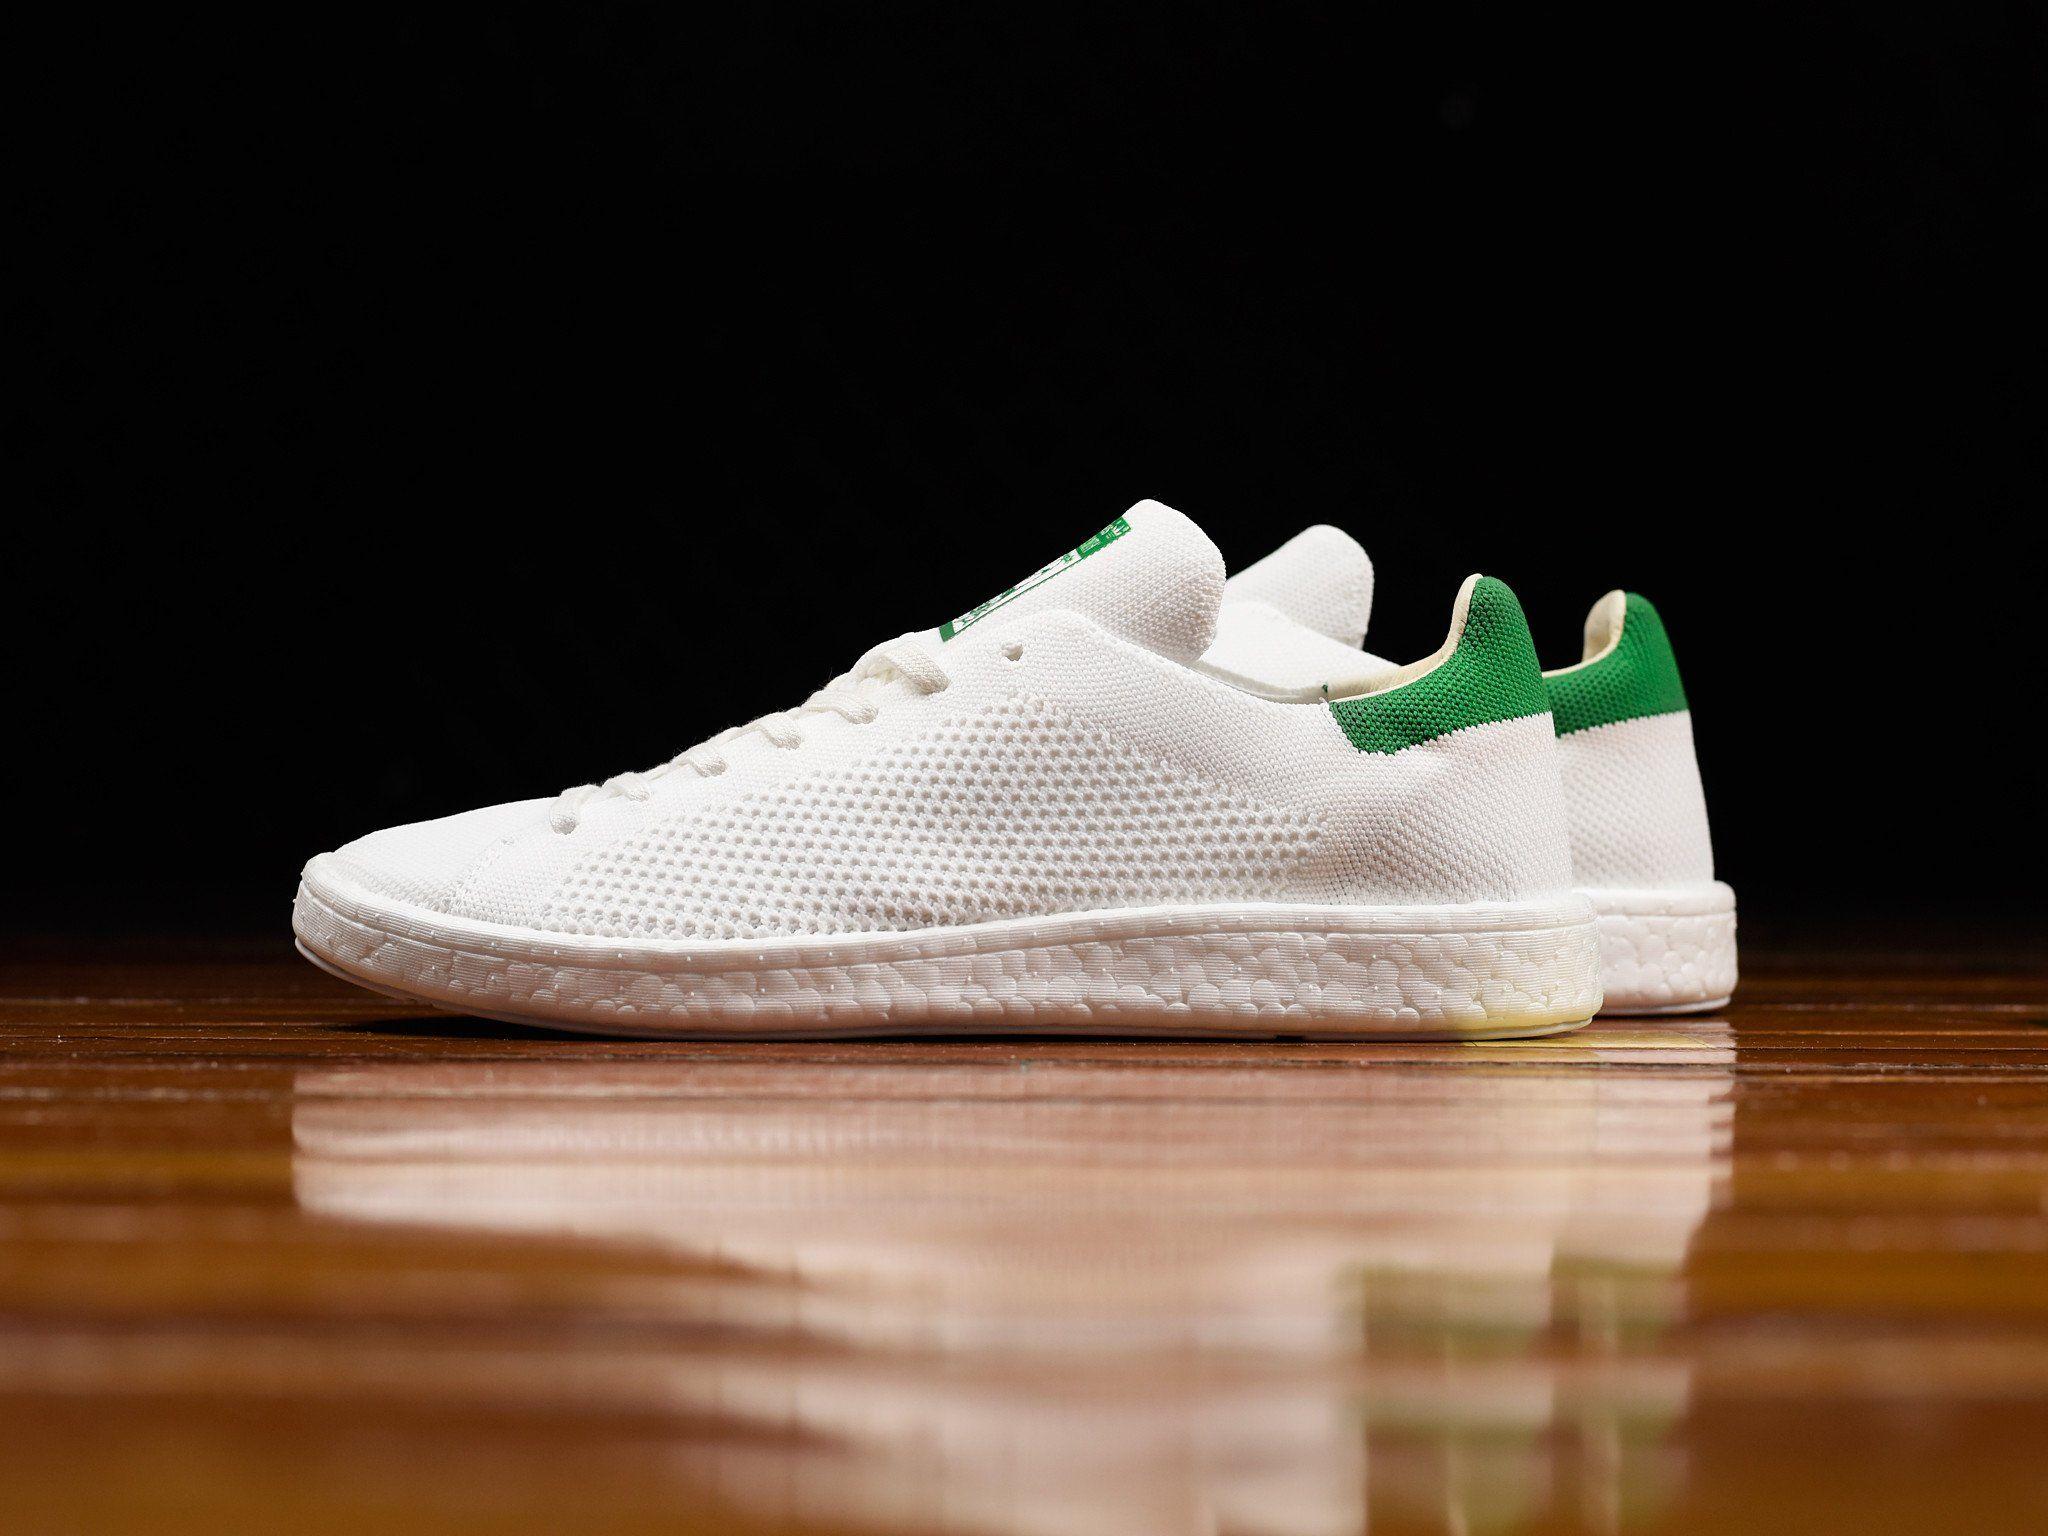 best sneakers 3fbbf dbae6 Men's Adidas Stan Smith Boost Primeknit [BB0013] | Adidas ...